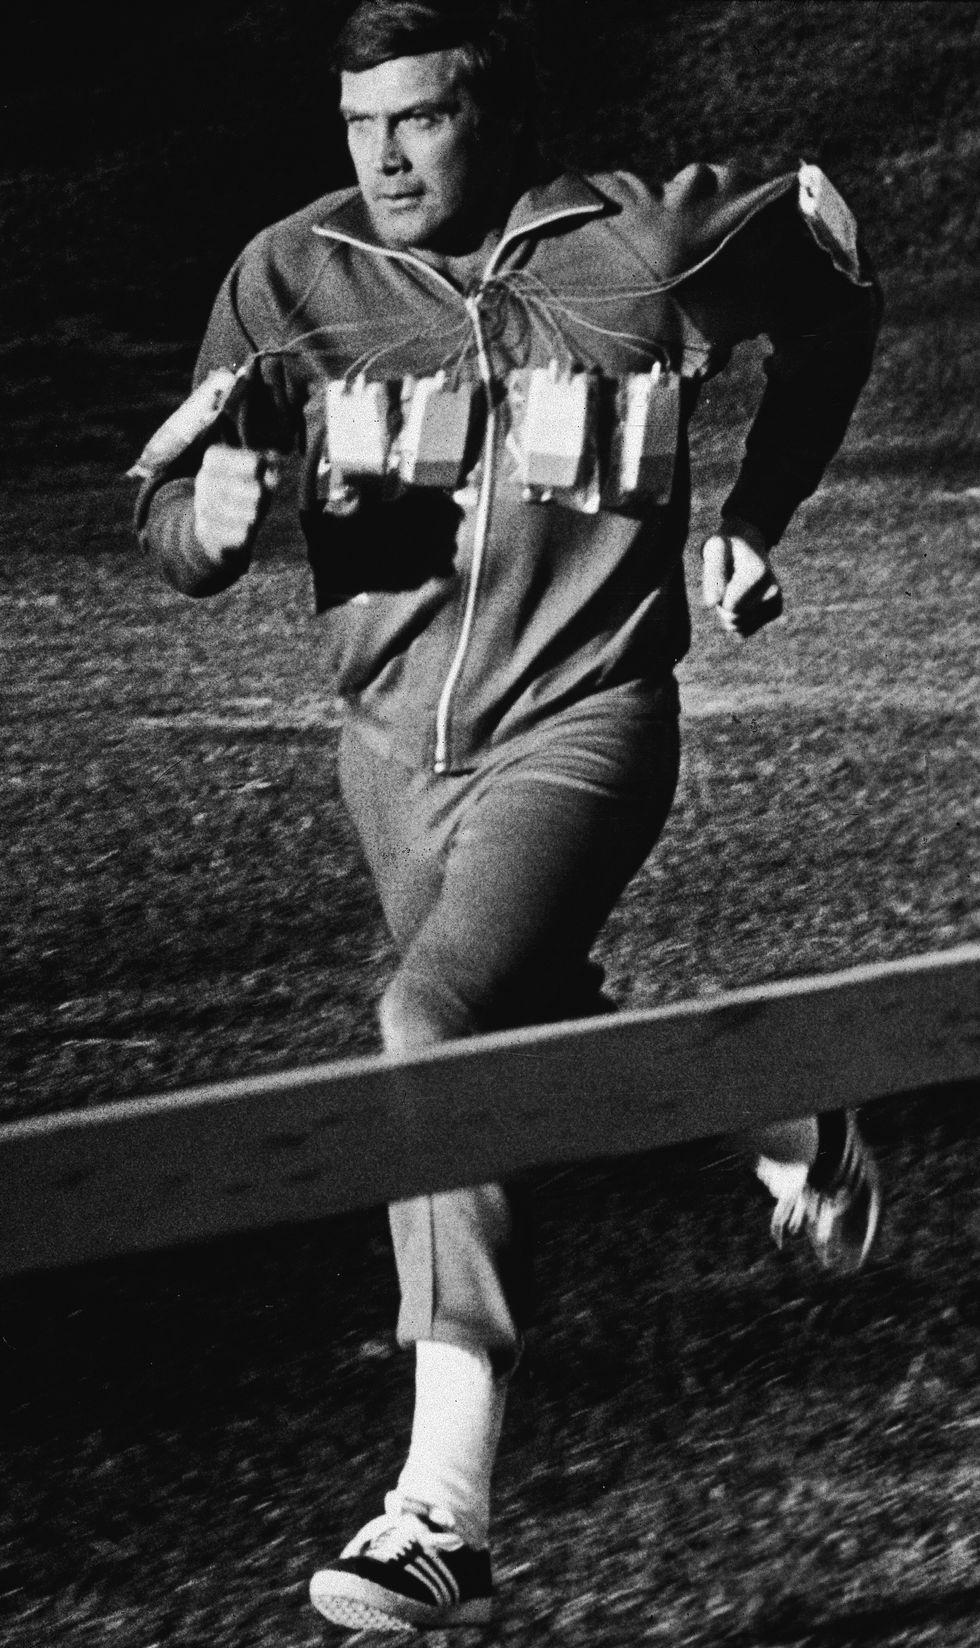 1975-giay-sneaker-elleman-0220-imdb